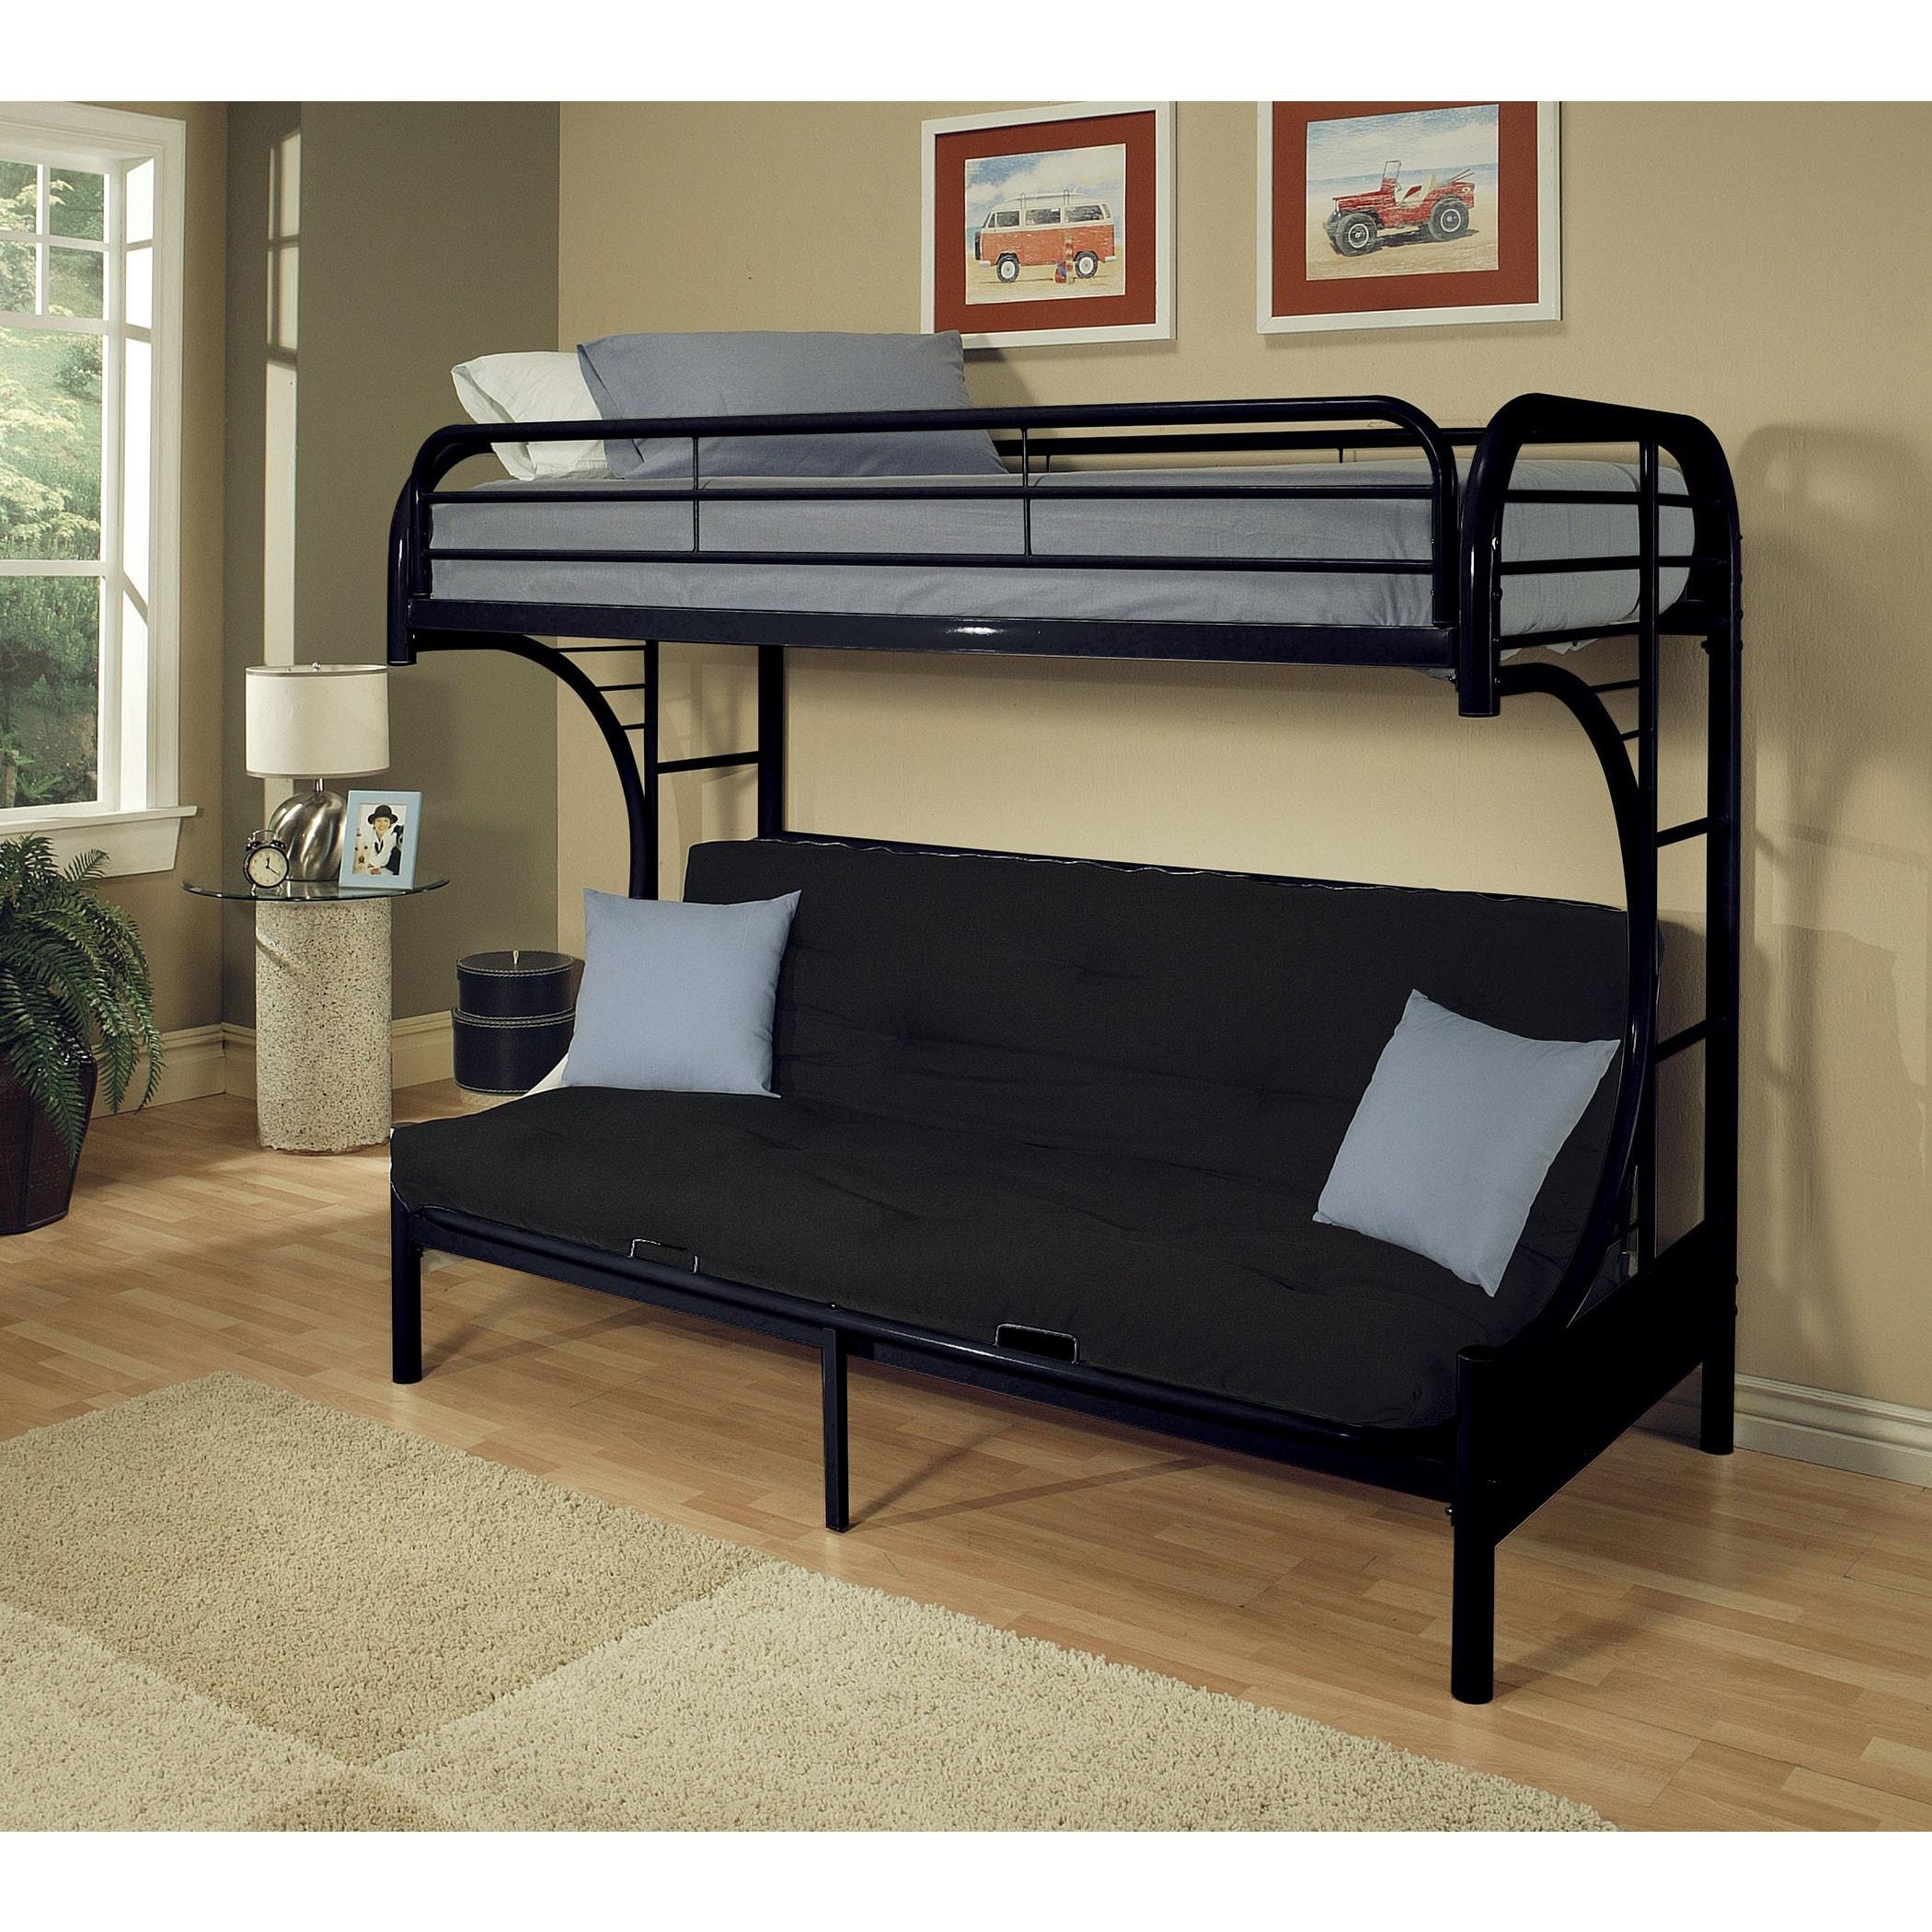 ACME Eclipse Black Twin XL/Queen Futon Bunk Bed (Black, 8...